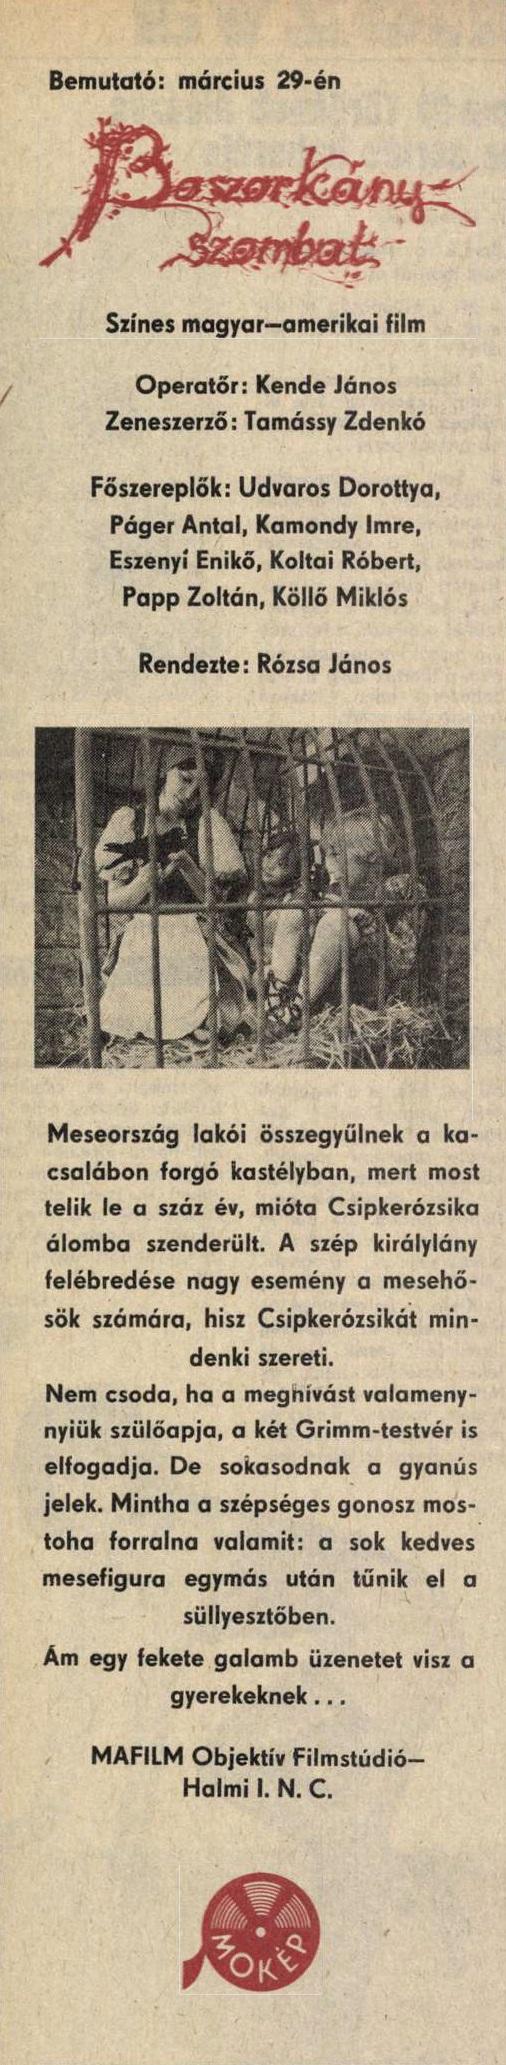 idokapszula_nb_i_1983_84_18_fordulo_mozi.jpg